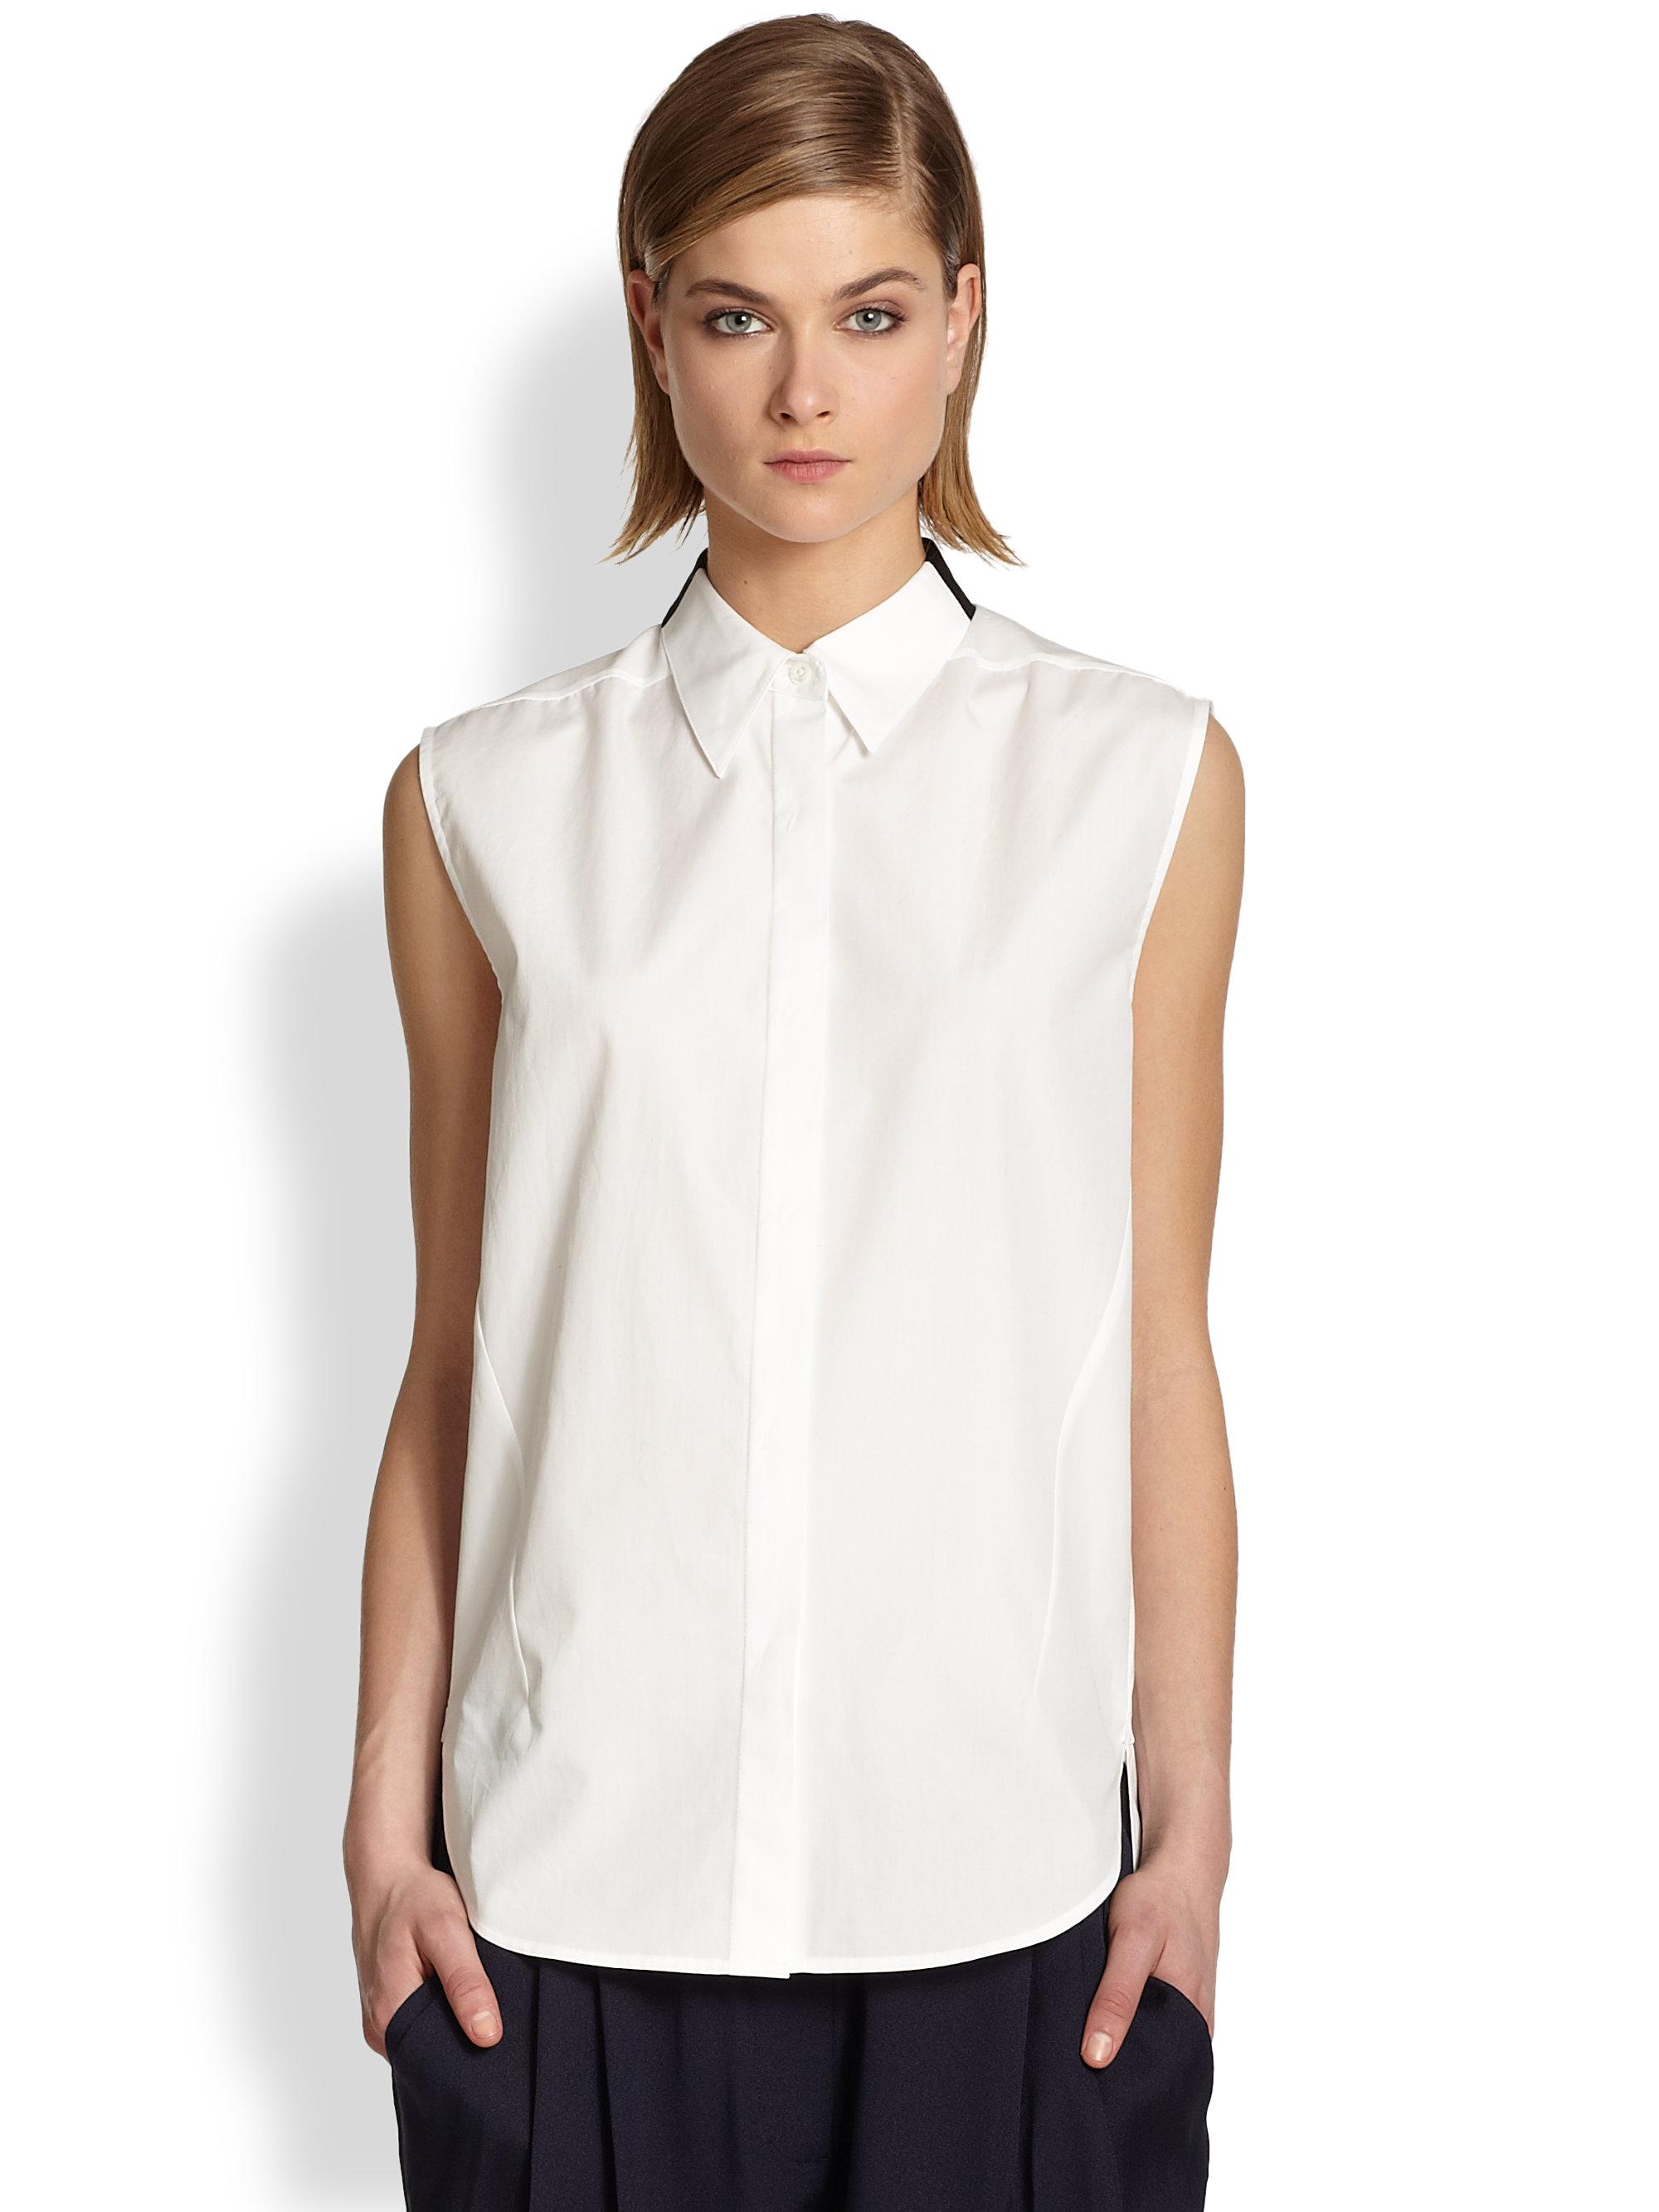 89b6a5a713c3e5 Lyst - 3.1 Phillip Lim Sleeveless Cotton Shirt in White